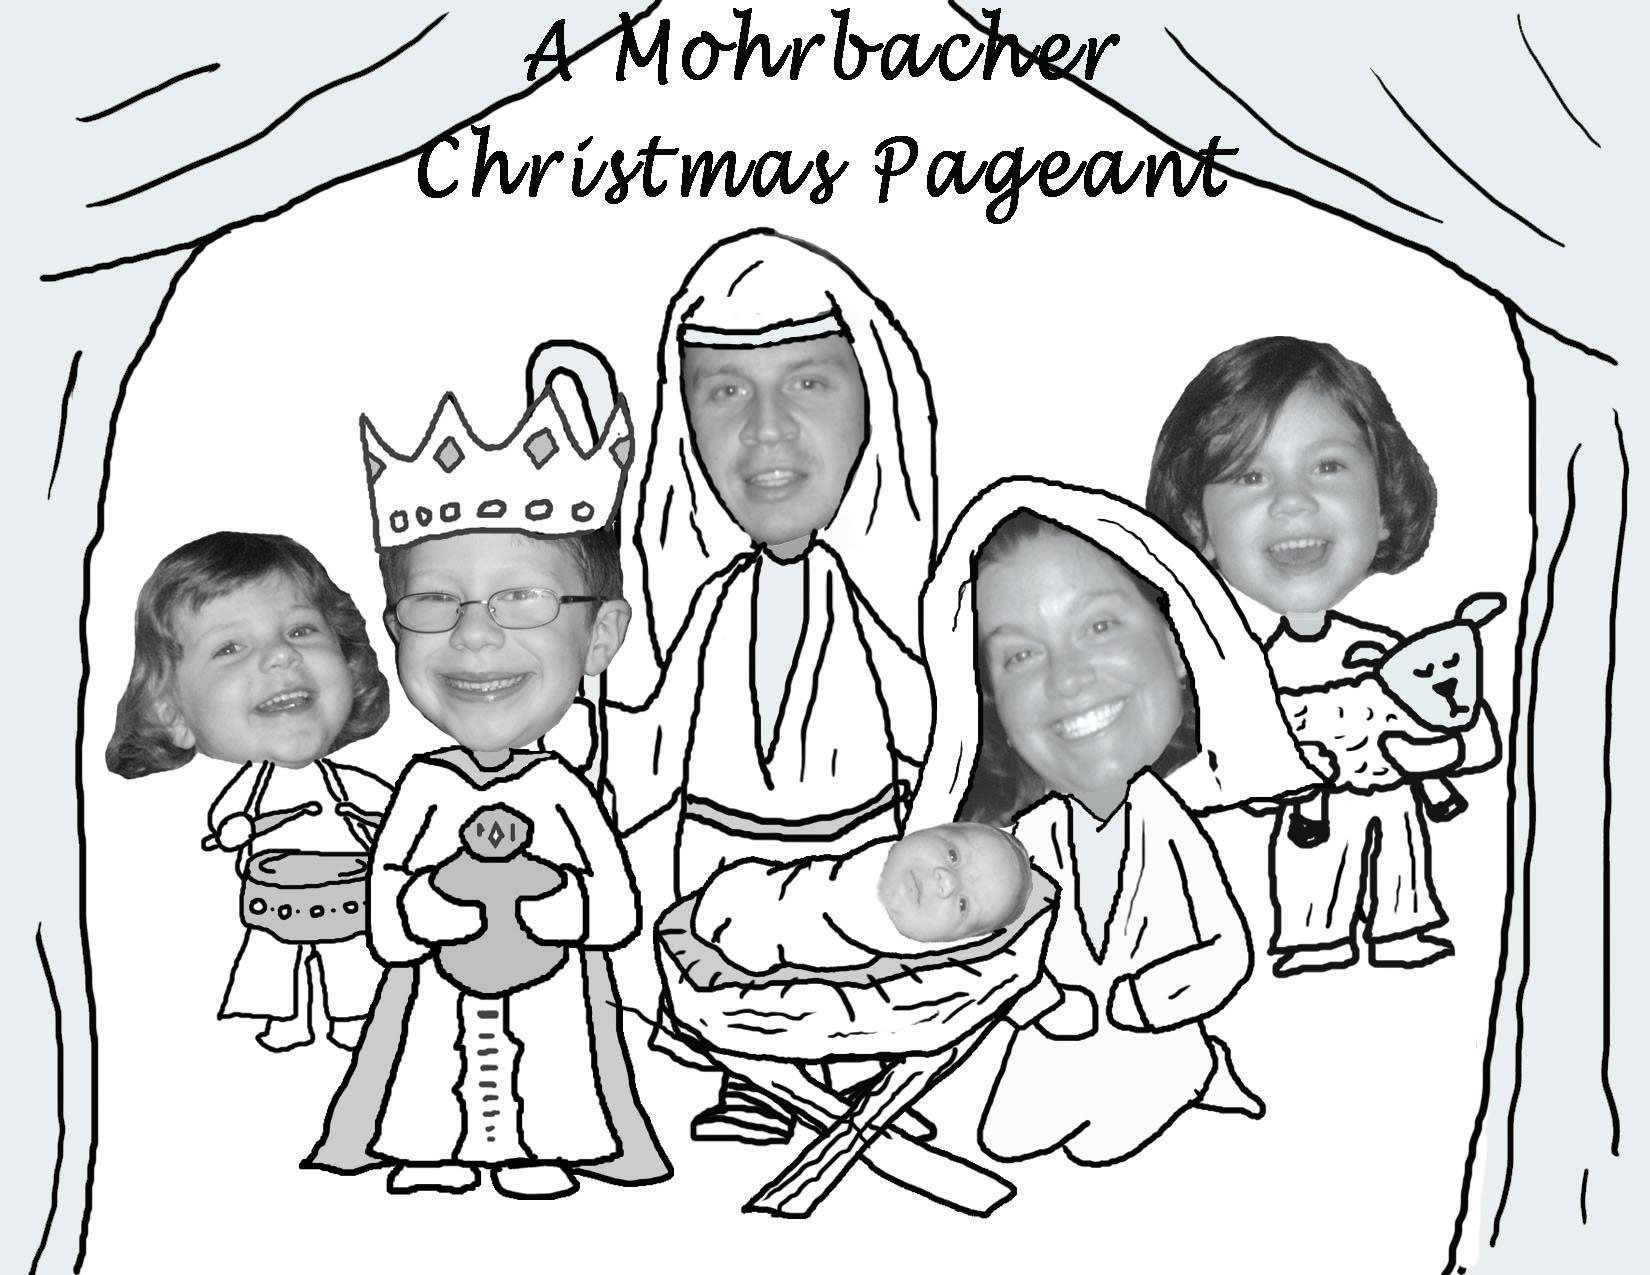 Fun Christmas Card Inspiration Skybachers Locker